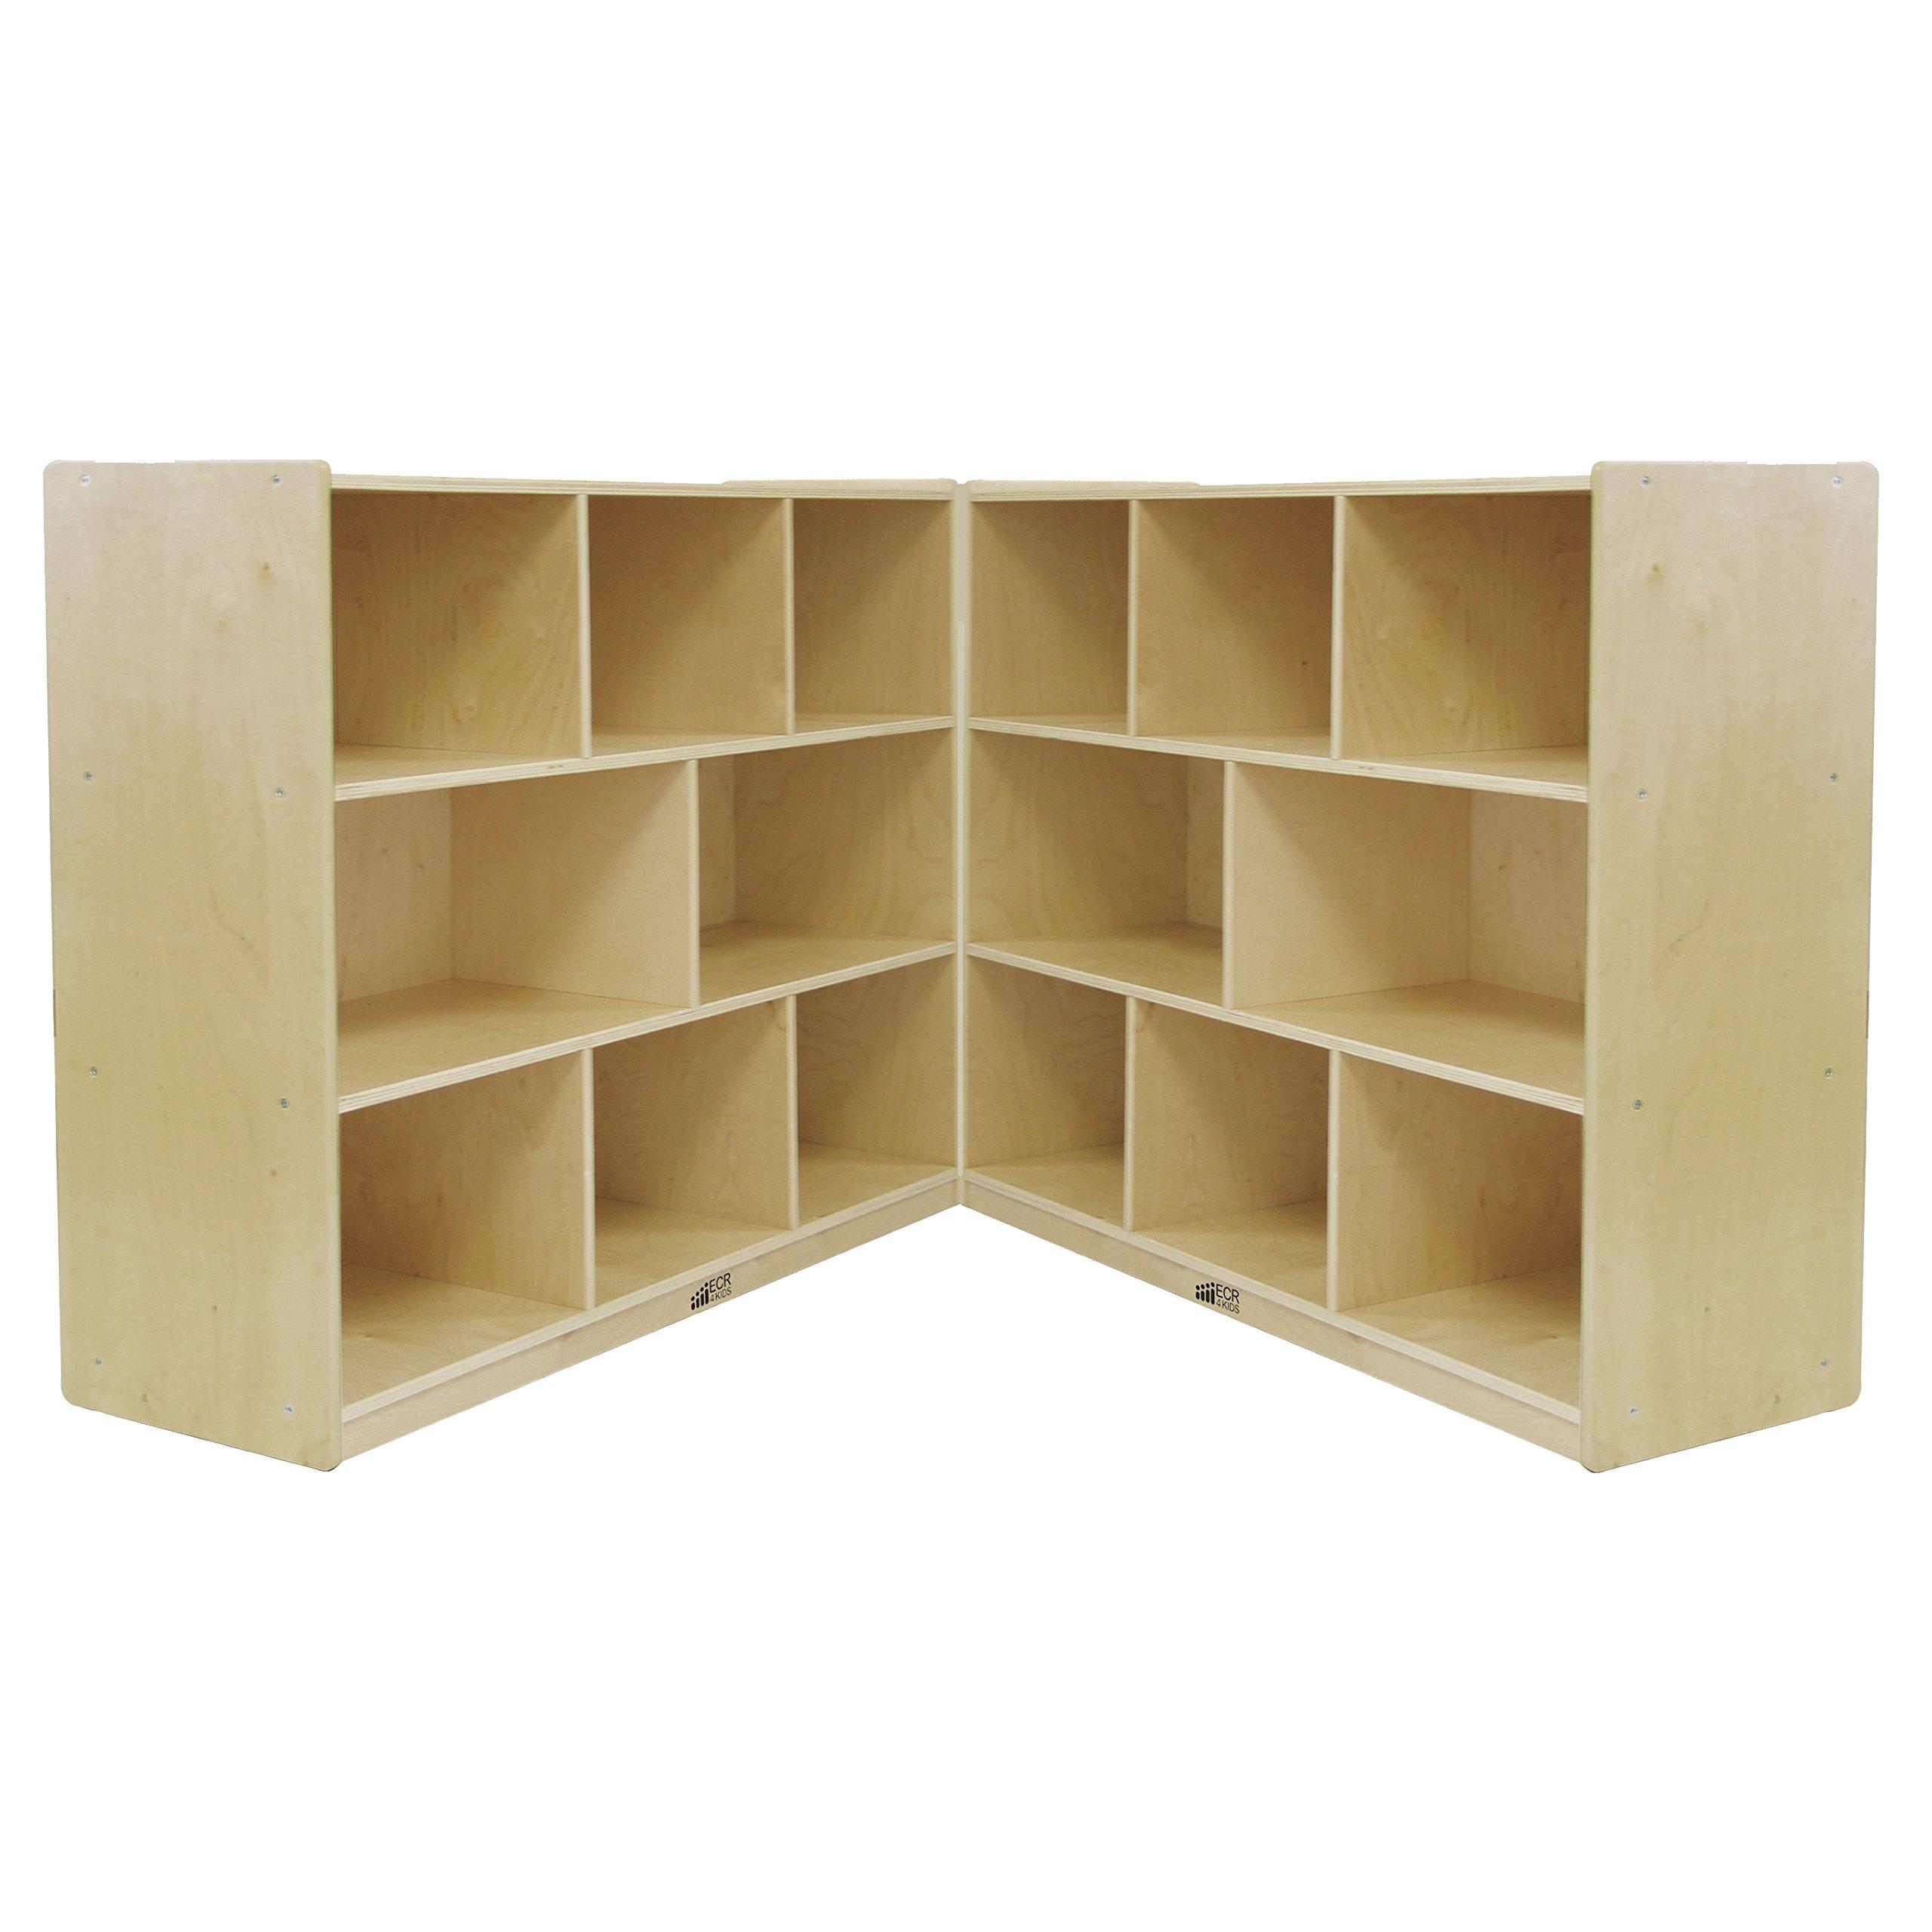 ECR4Kids Birch School Classroom Fold & Lock, 8-Section Storage Cabinet, Natural, 36'' H